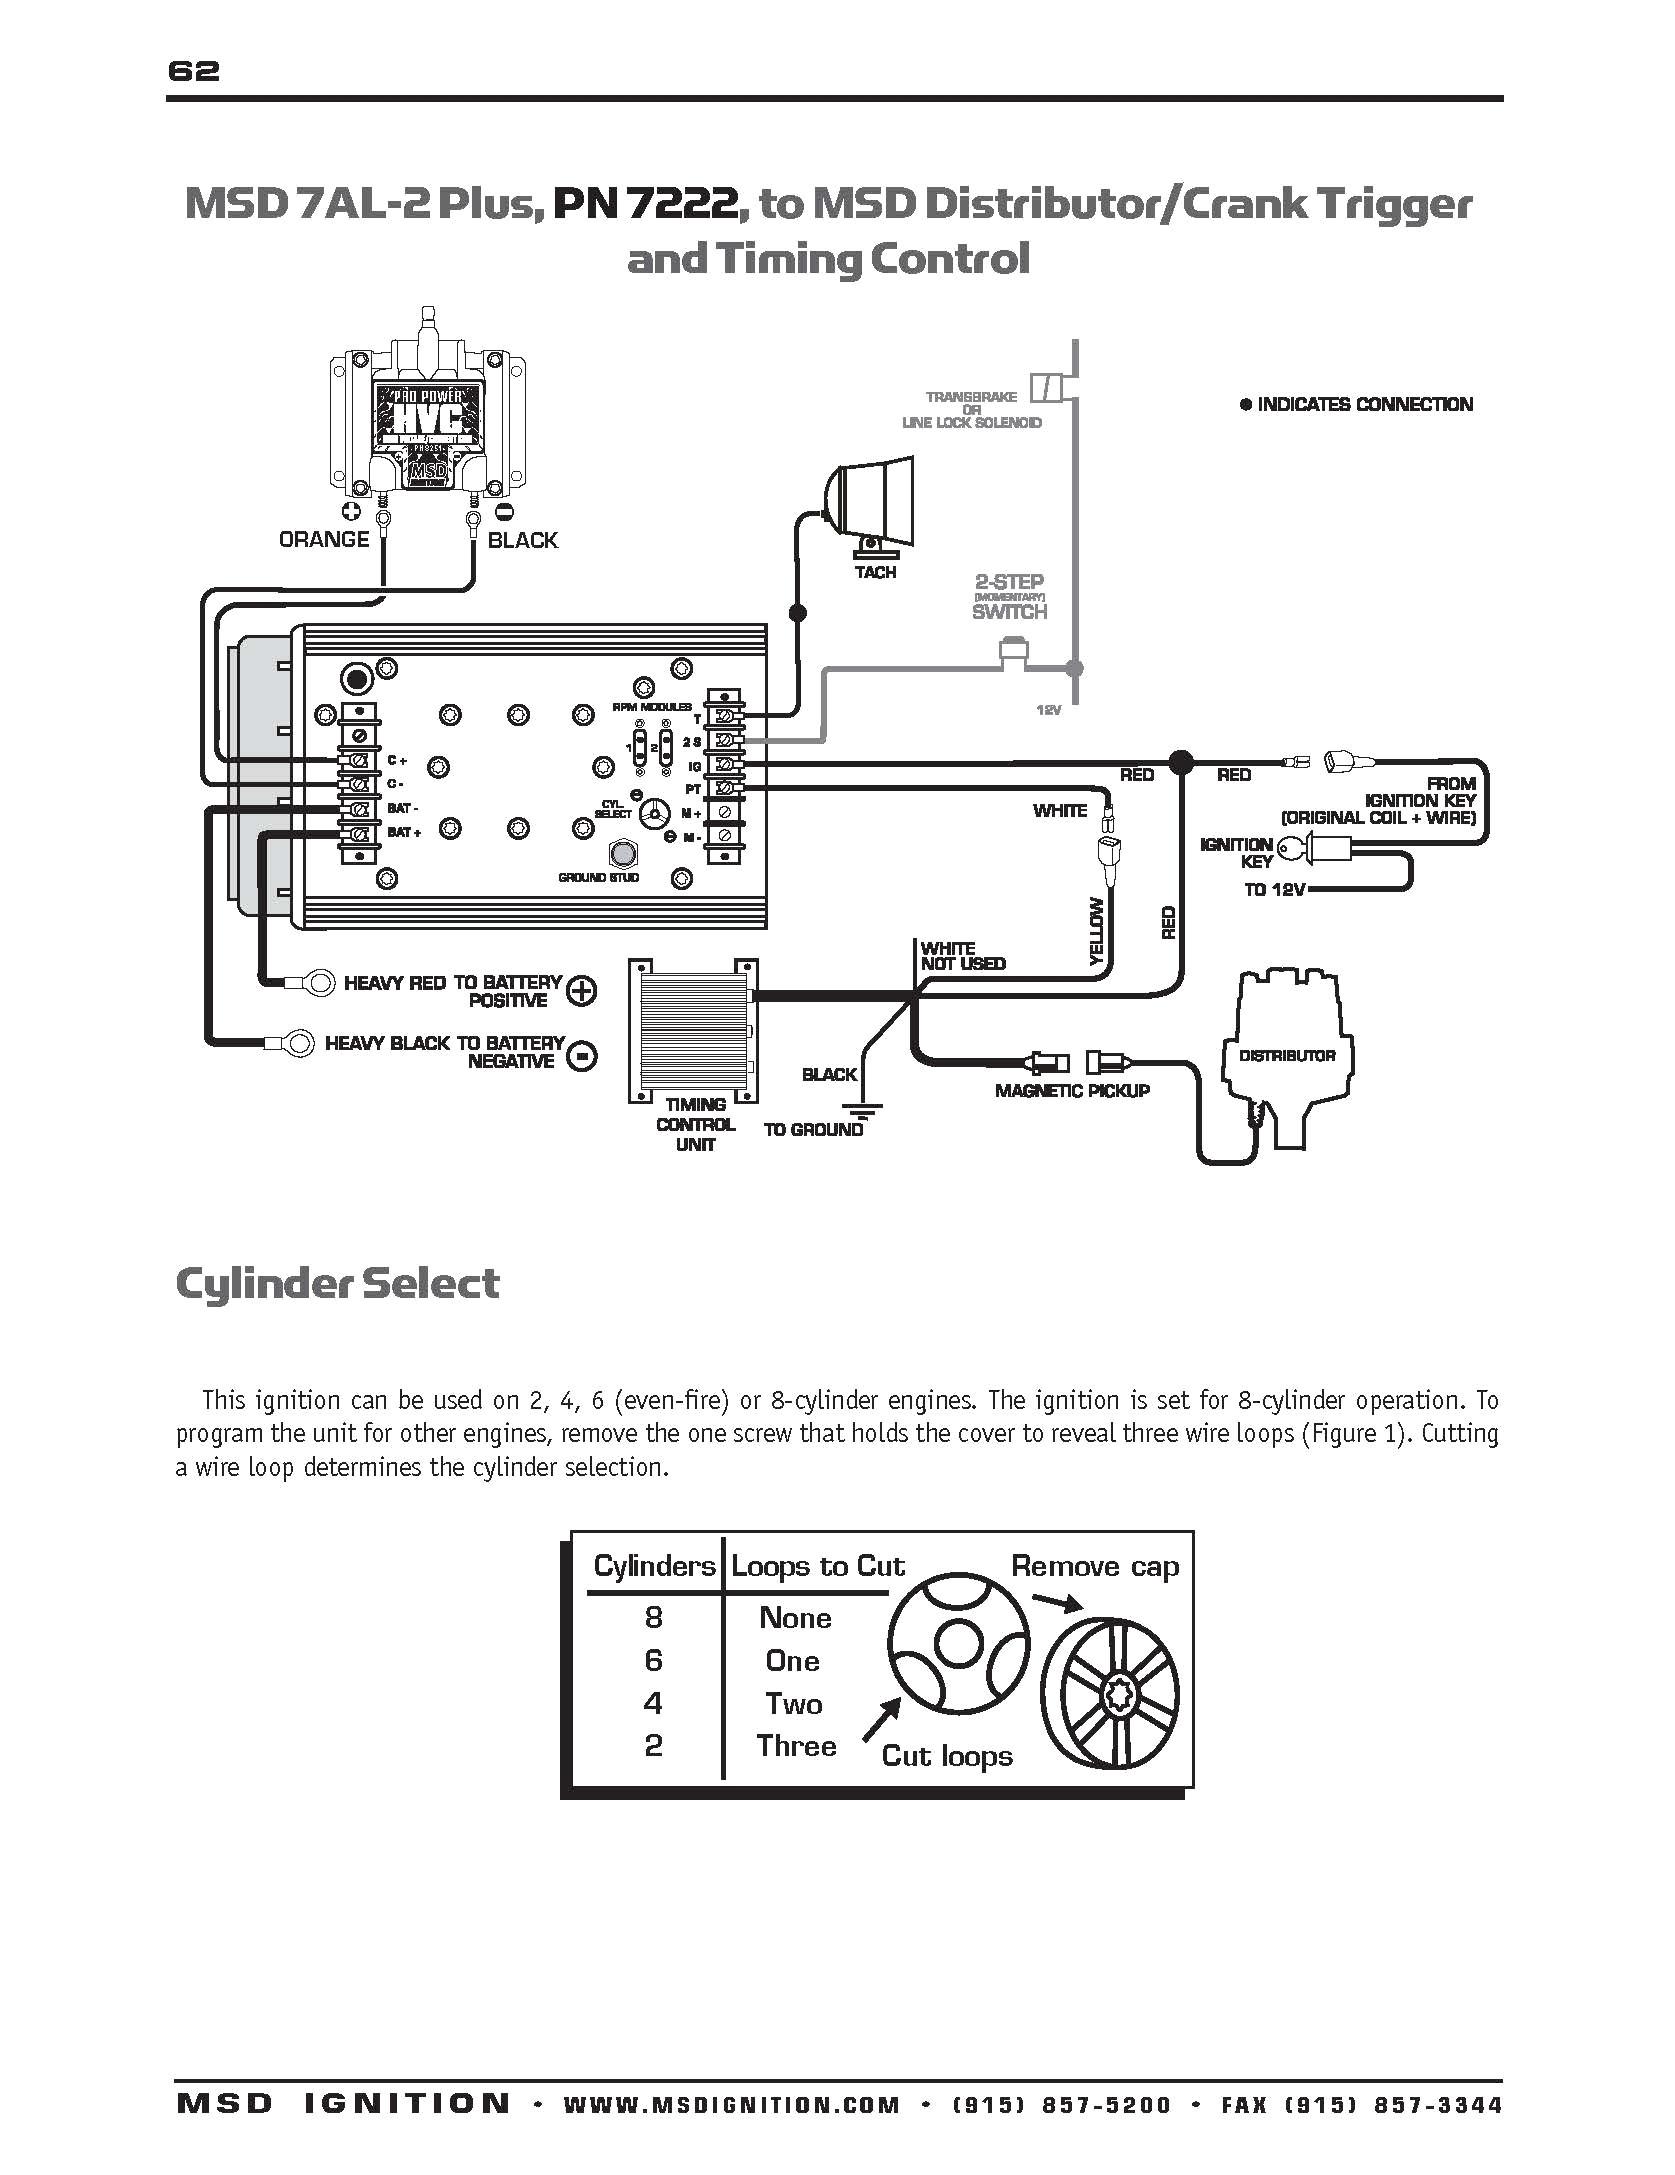 msd wiring diagram 7al 2 wiring diagram wiring diagram data msd wiring diagrams and technotes 7al 2 wiring diagram wiring diagram data